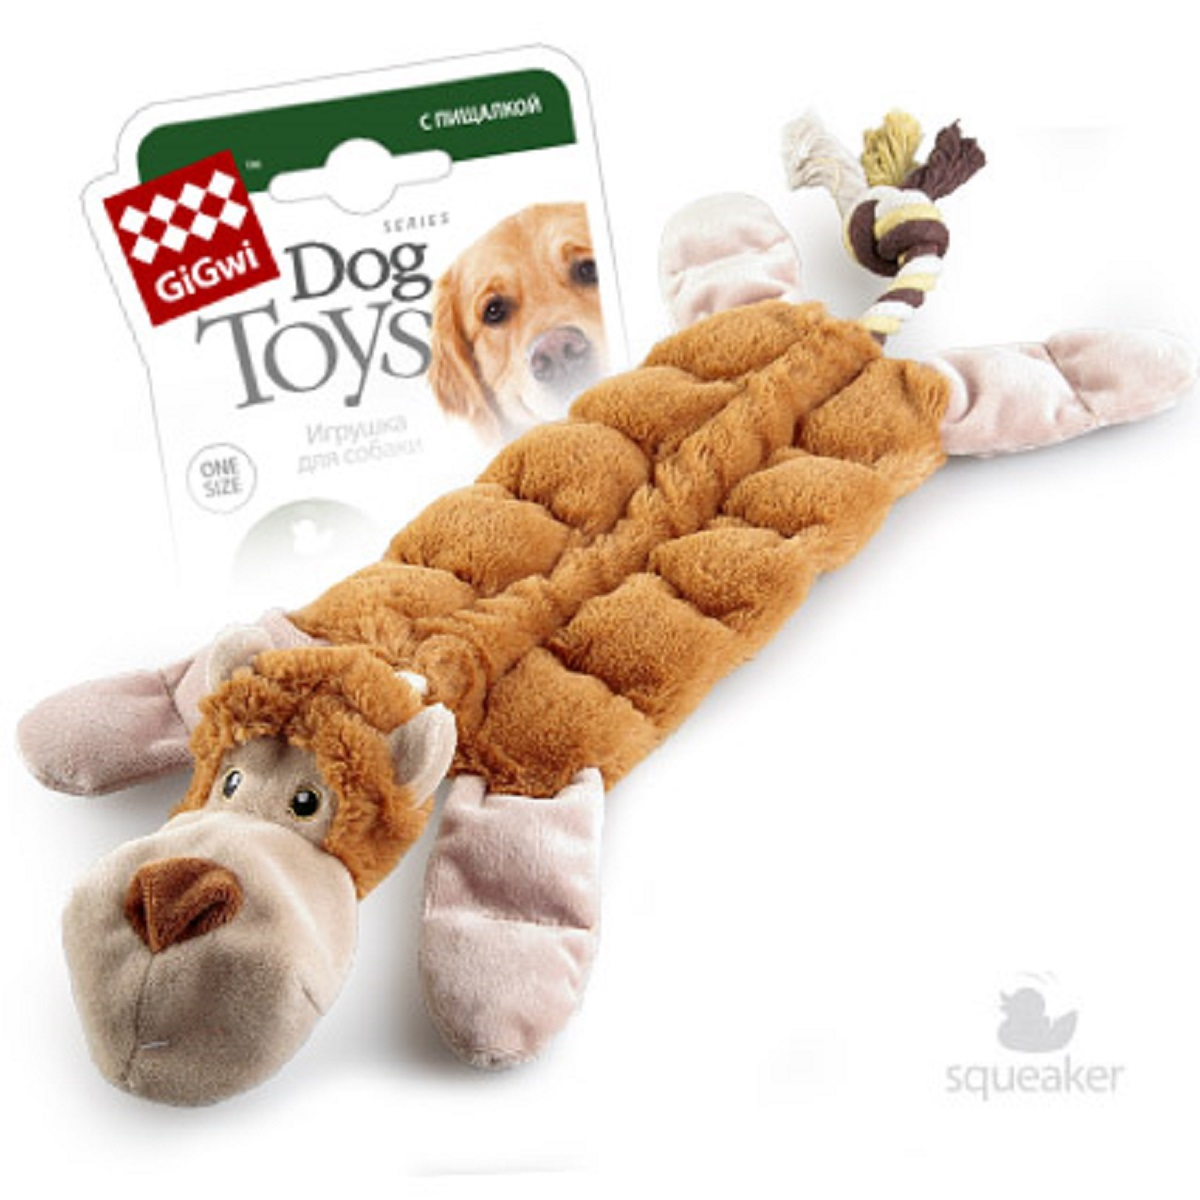 Игрушка для собак GiGwi Обезьяна, с пищалками, 34 см игрушка gigwi jumball big ball is a good ball мяч с захватом для собак 75367